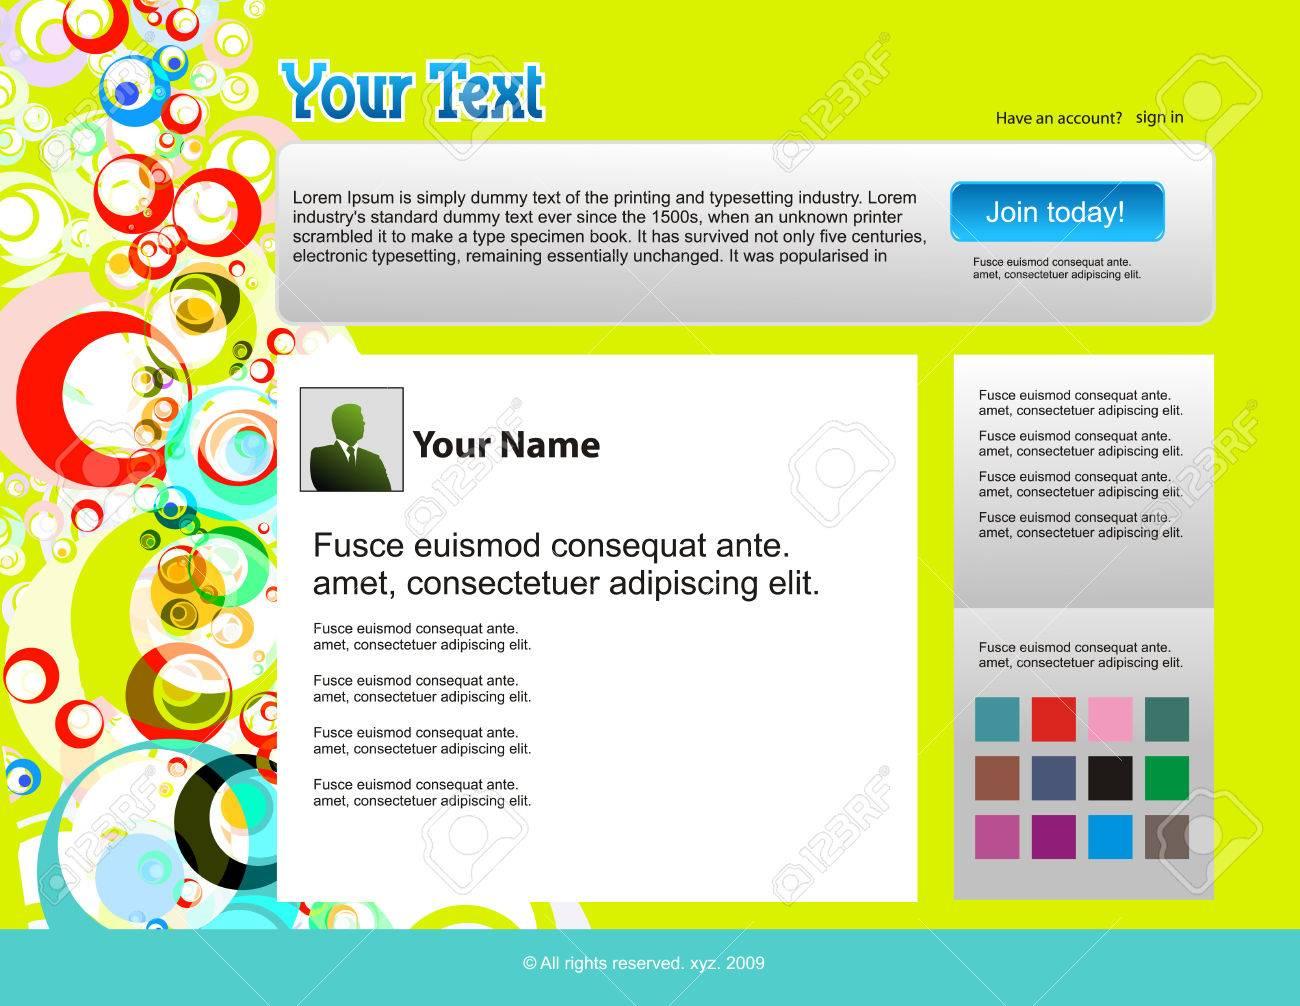 twitter themes website design template background illustration